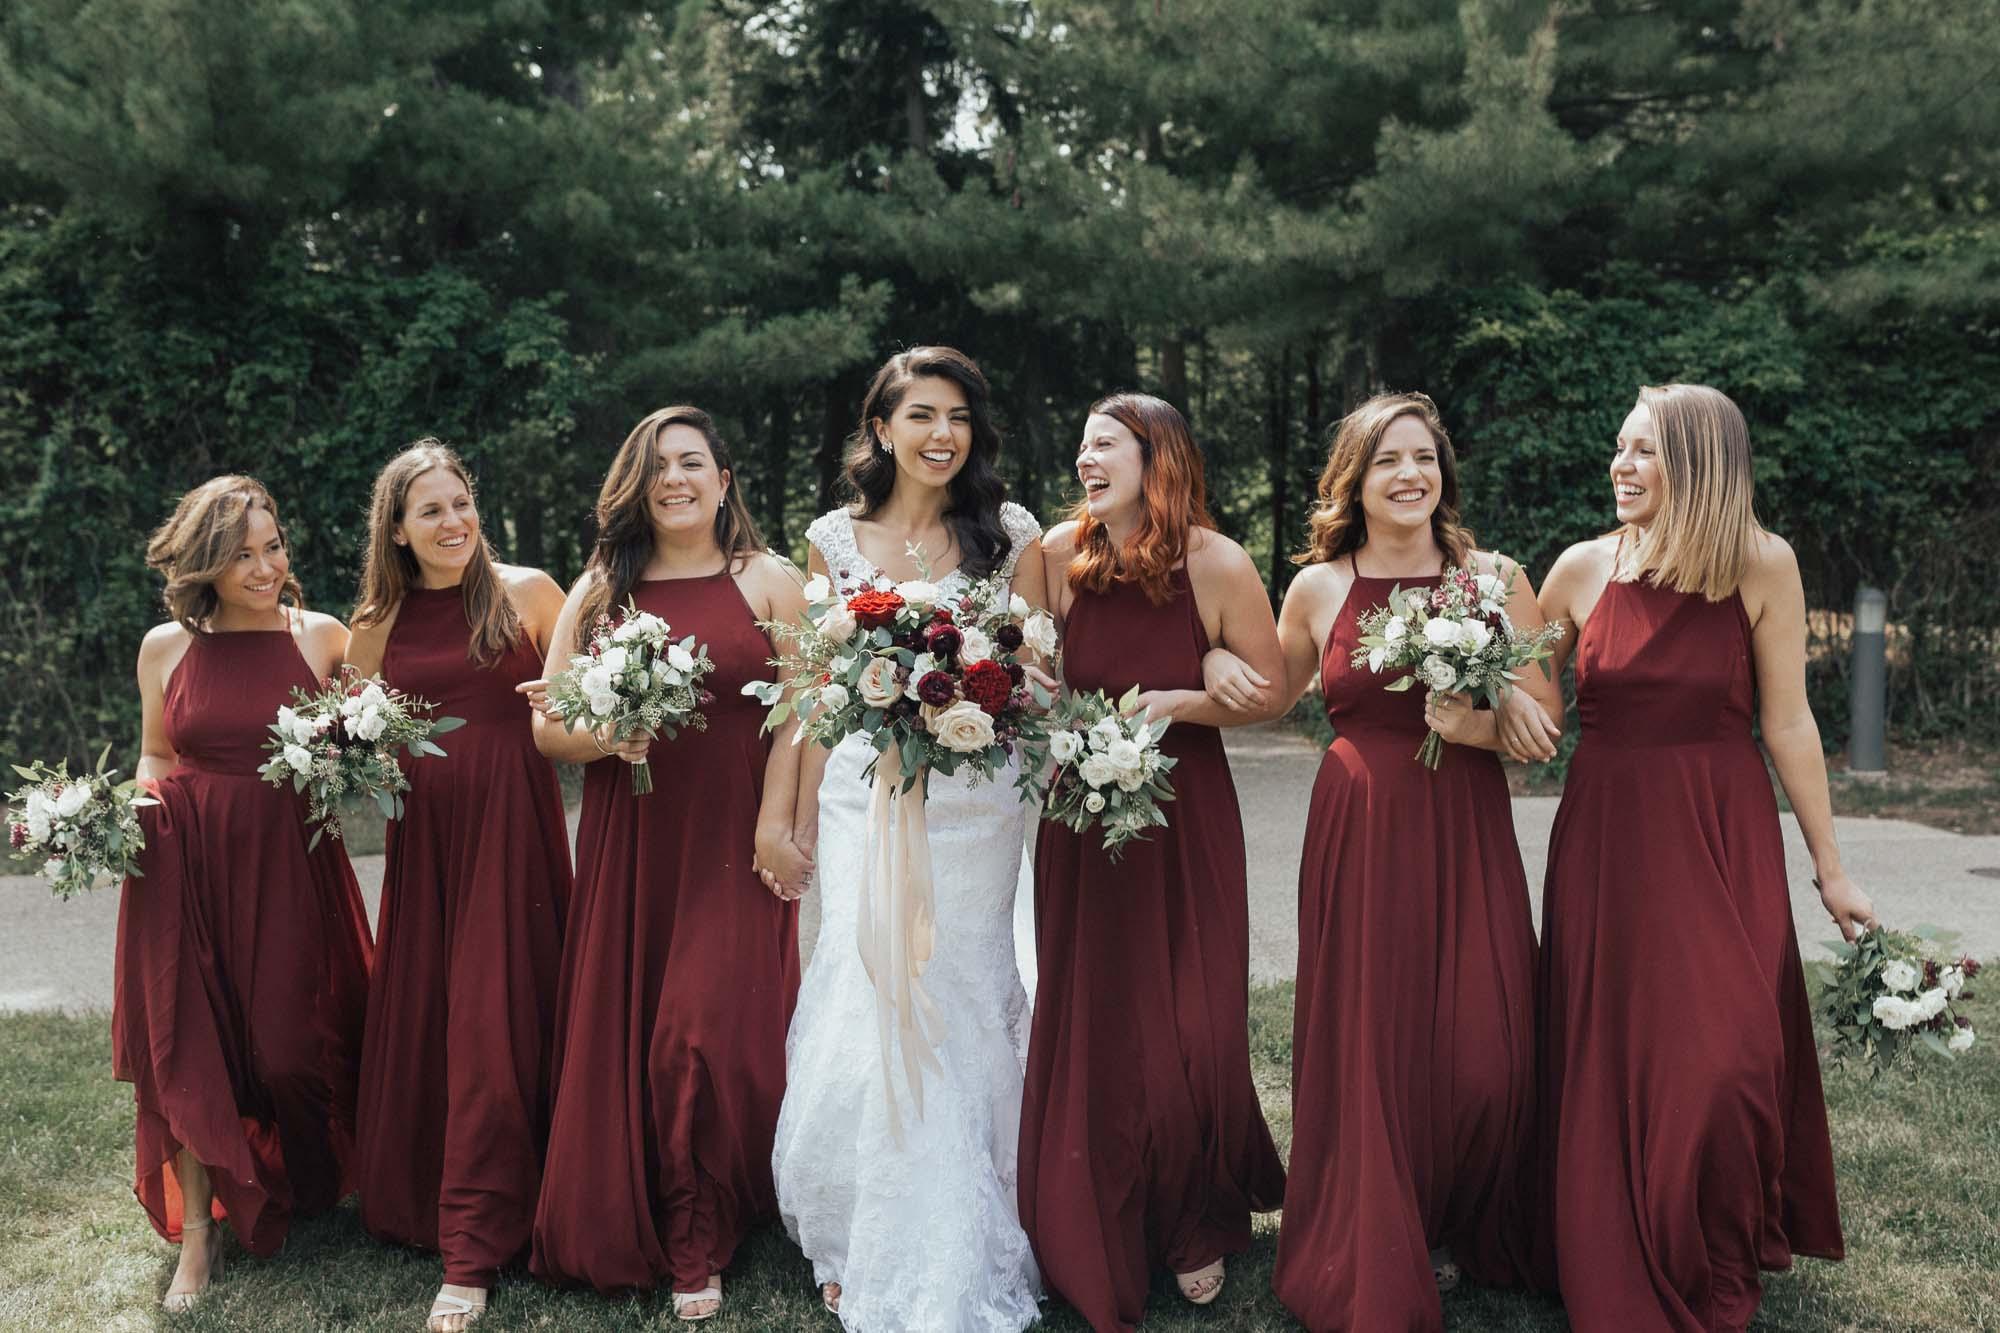 champaign_il_wedding_photography-0233.jpg